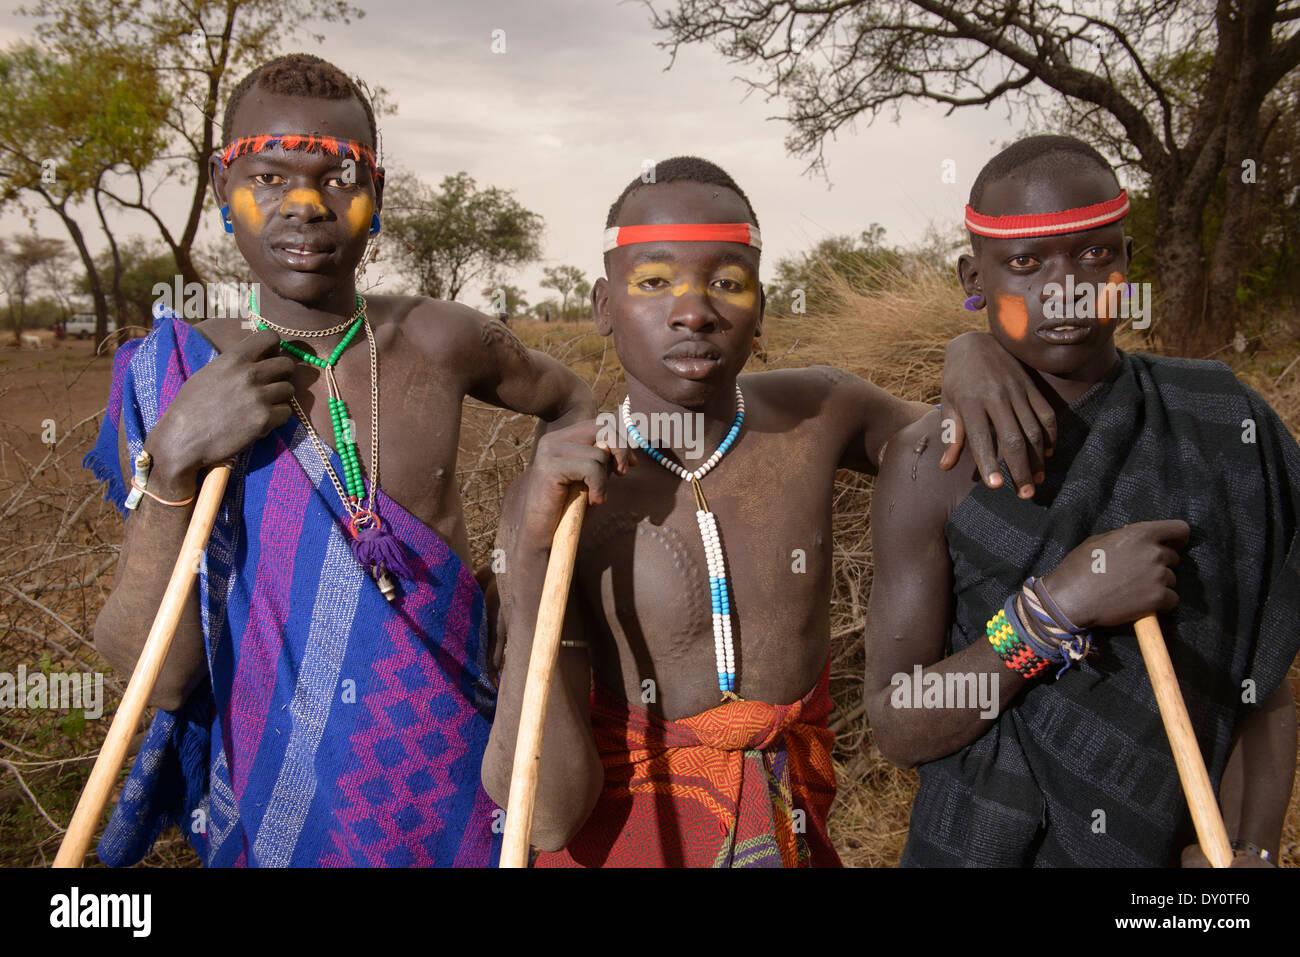 mursi Boy Mursi boys in the Lower Omo Valley of Ethiopia - Stock Image